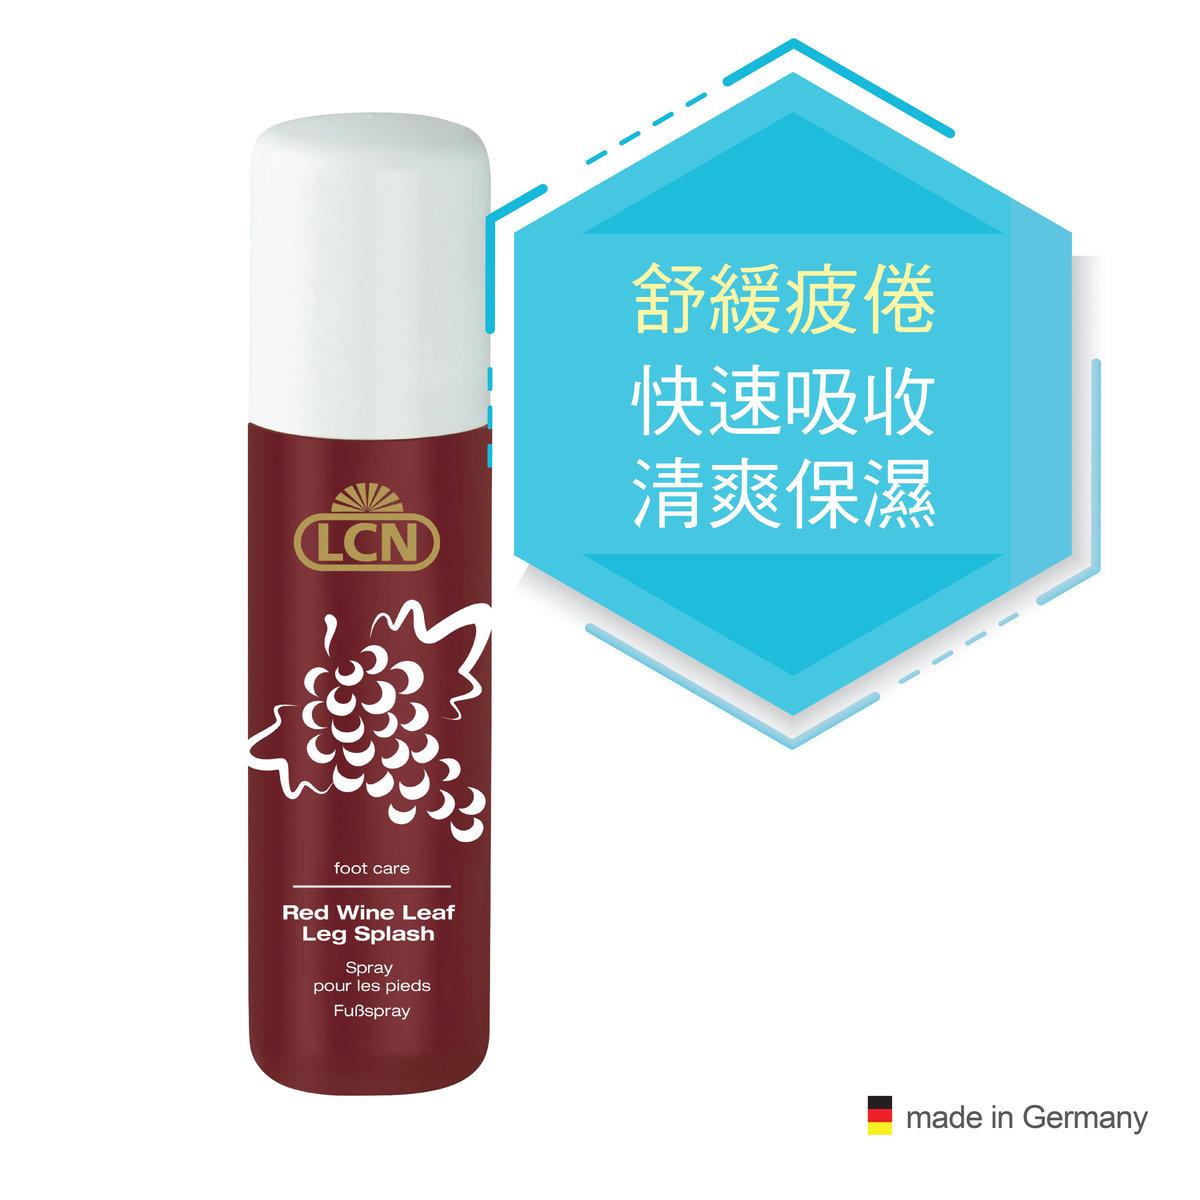 LCN Red Wine leaf leg Splash Spray 110ml